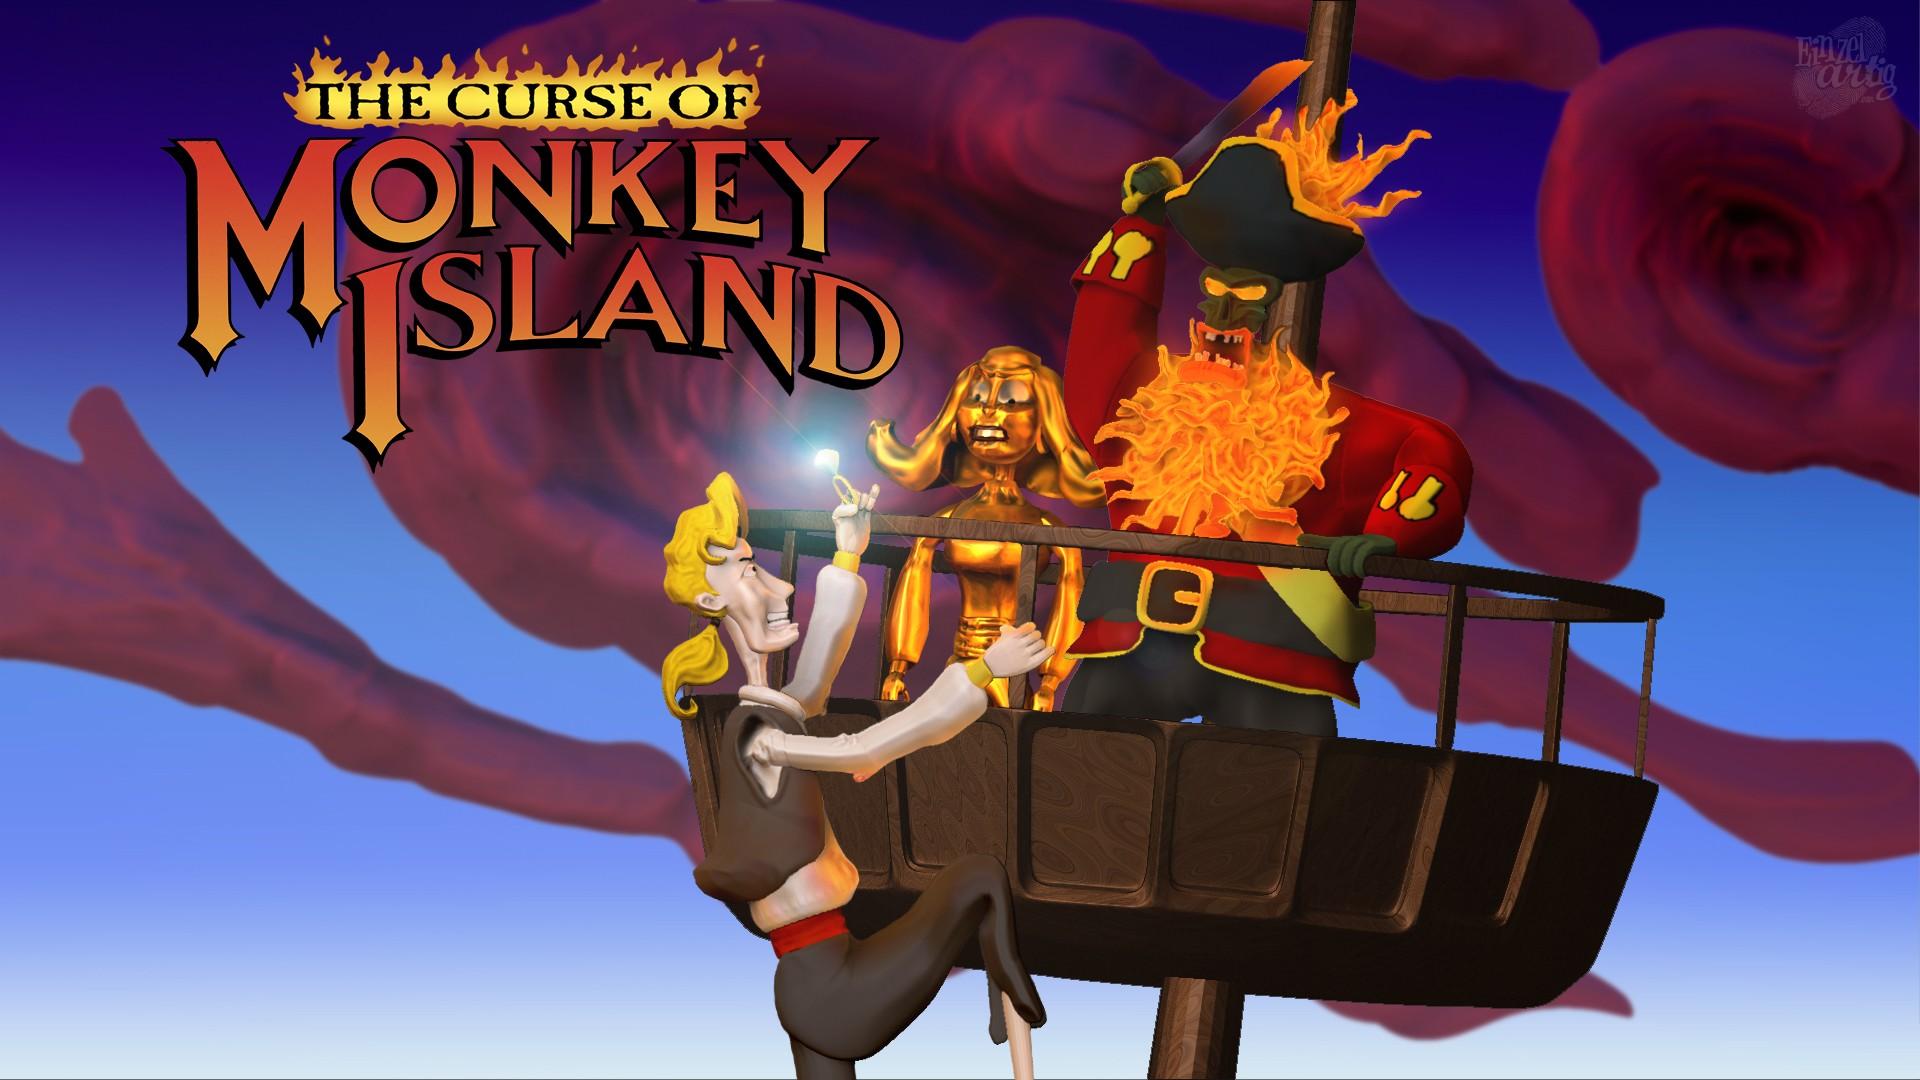 The curse of monkey island - 5 2